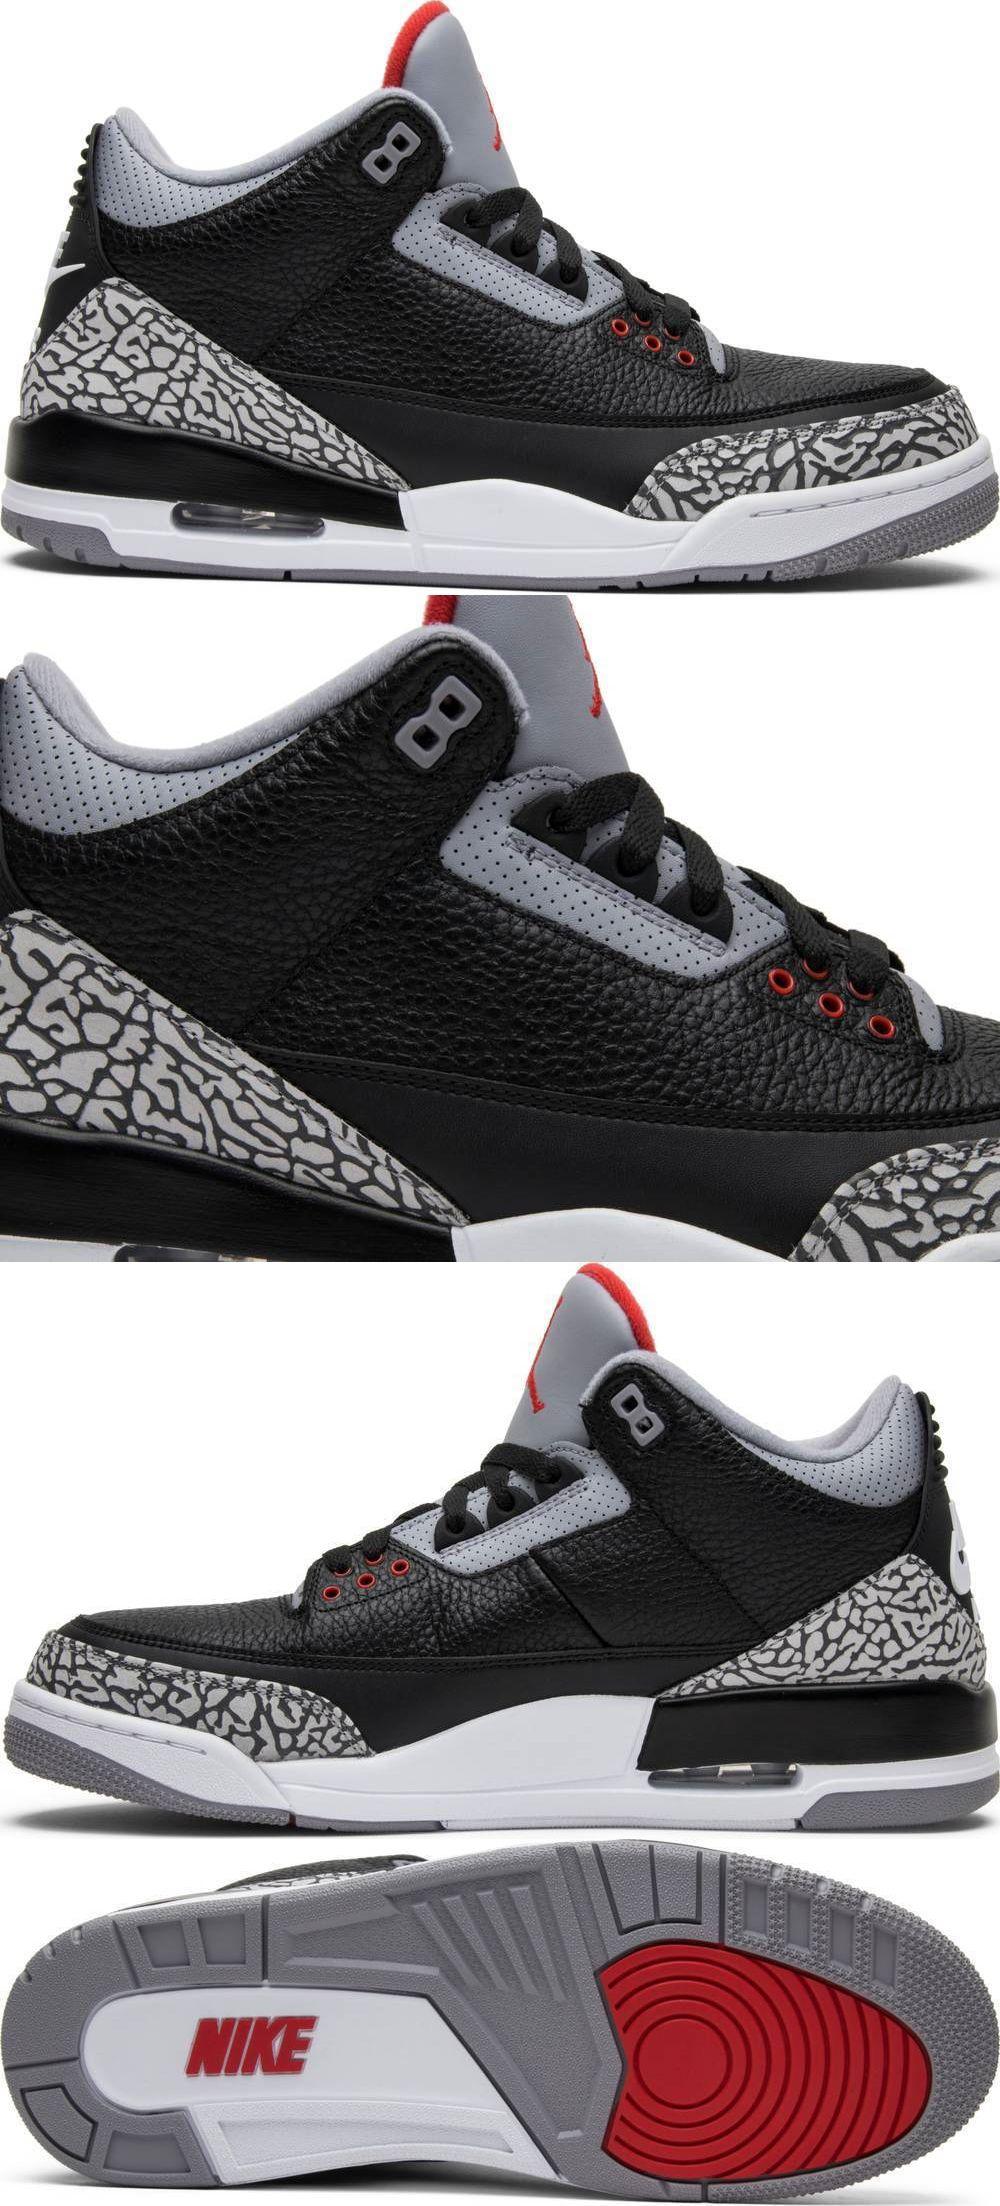 07c9eb449b1224 Athletic 15709  2018 Air Jordan Retro 3 Og Black Cement Men Size 8 ...